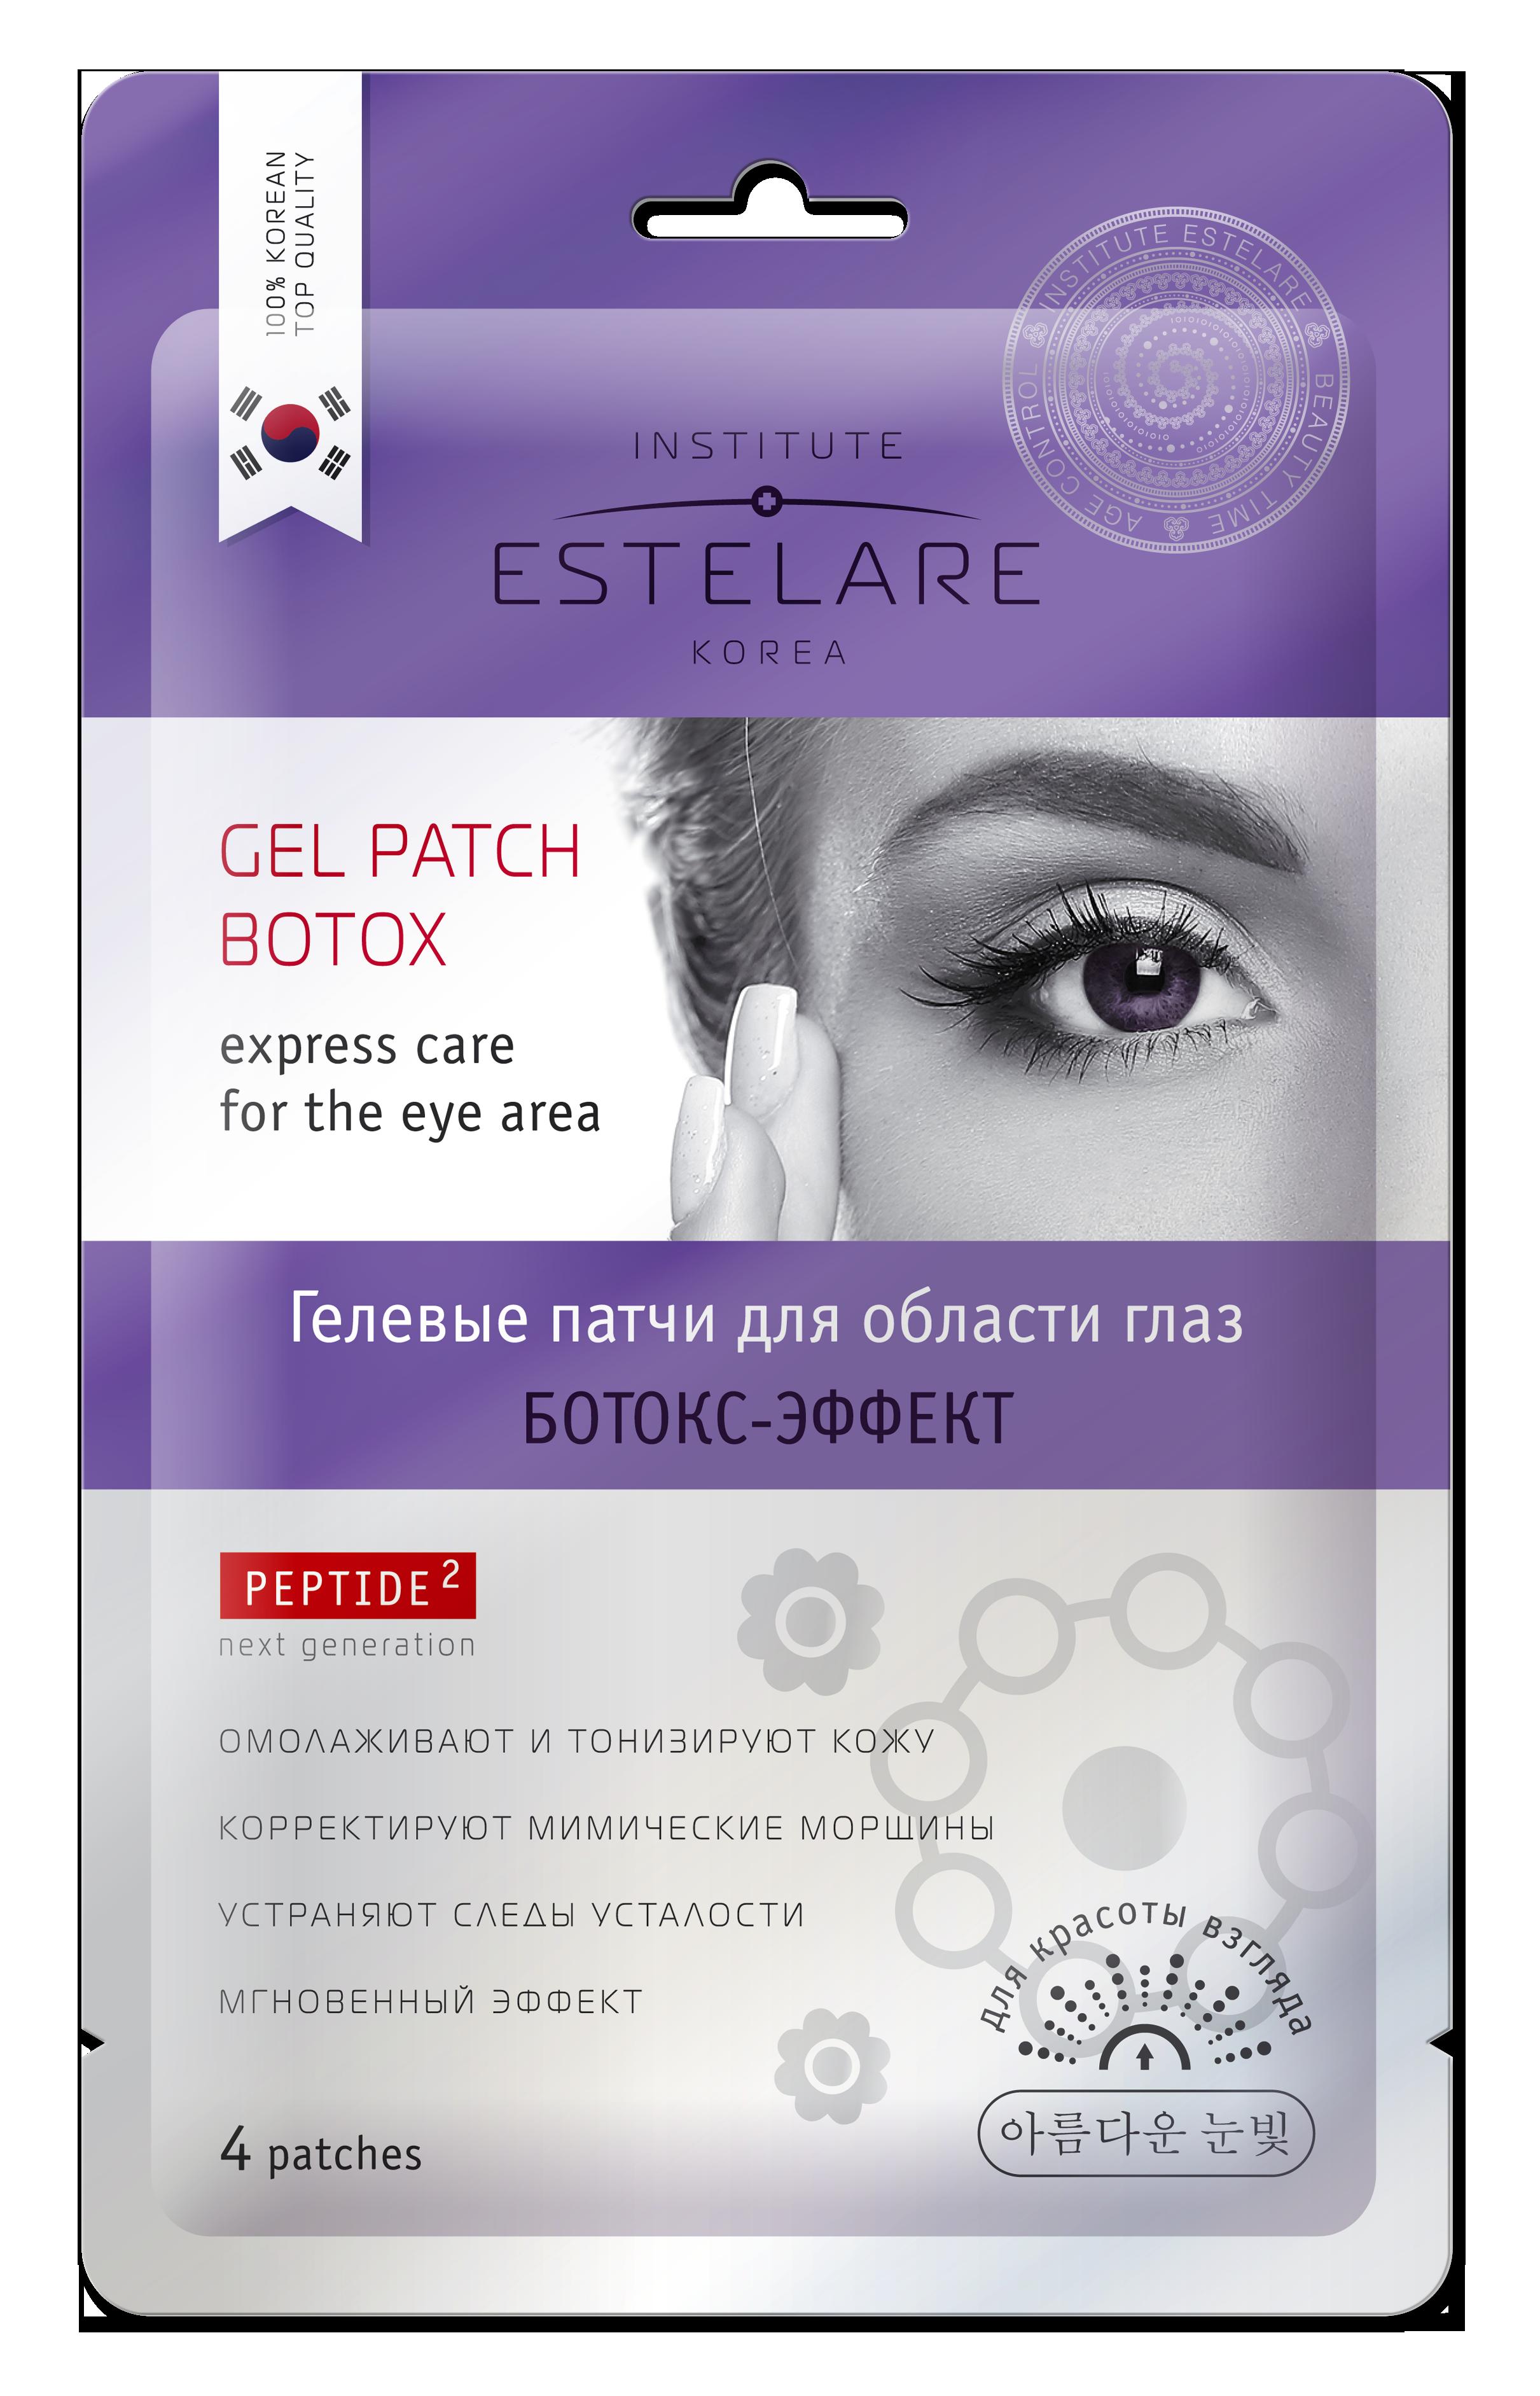 ESTELARE Патчи гелевые для области глаз & Ботокс-эффект&  / ESTELARE 1г х 4 шт~ -  Патчи